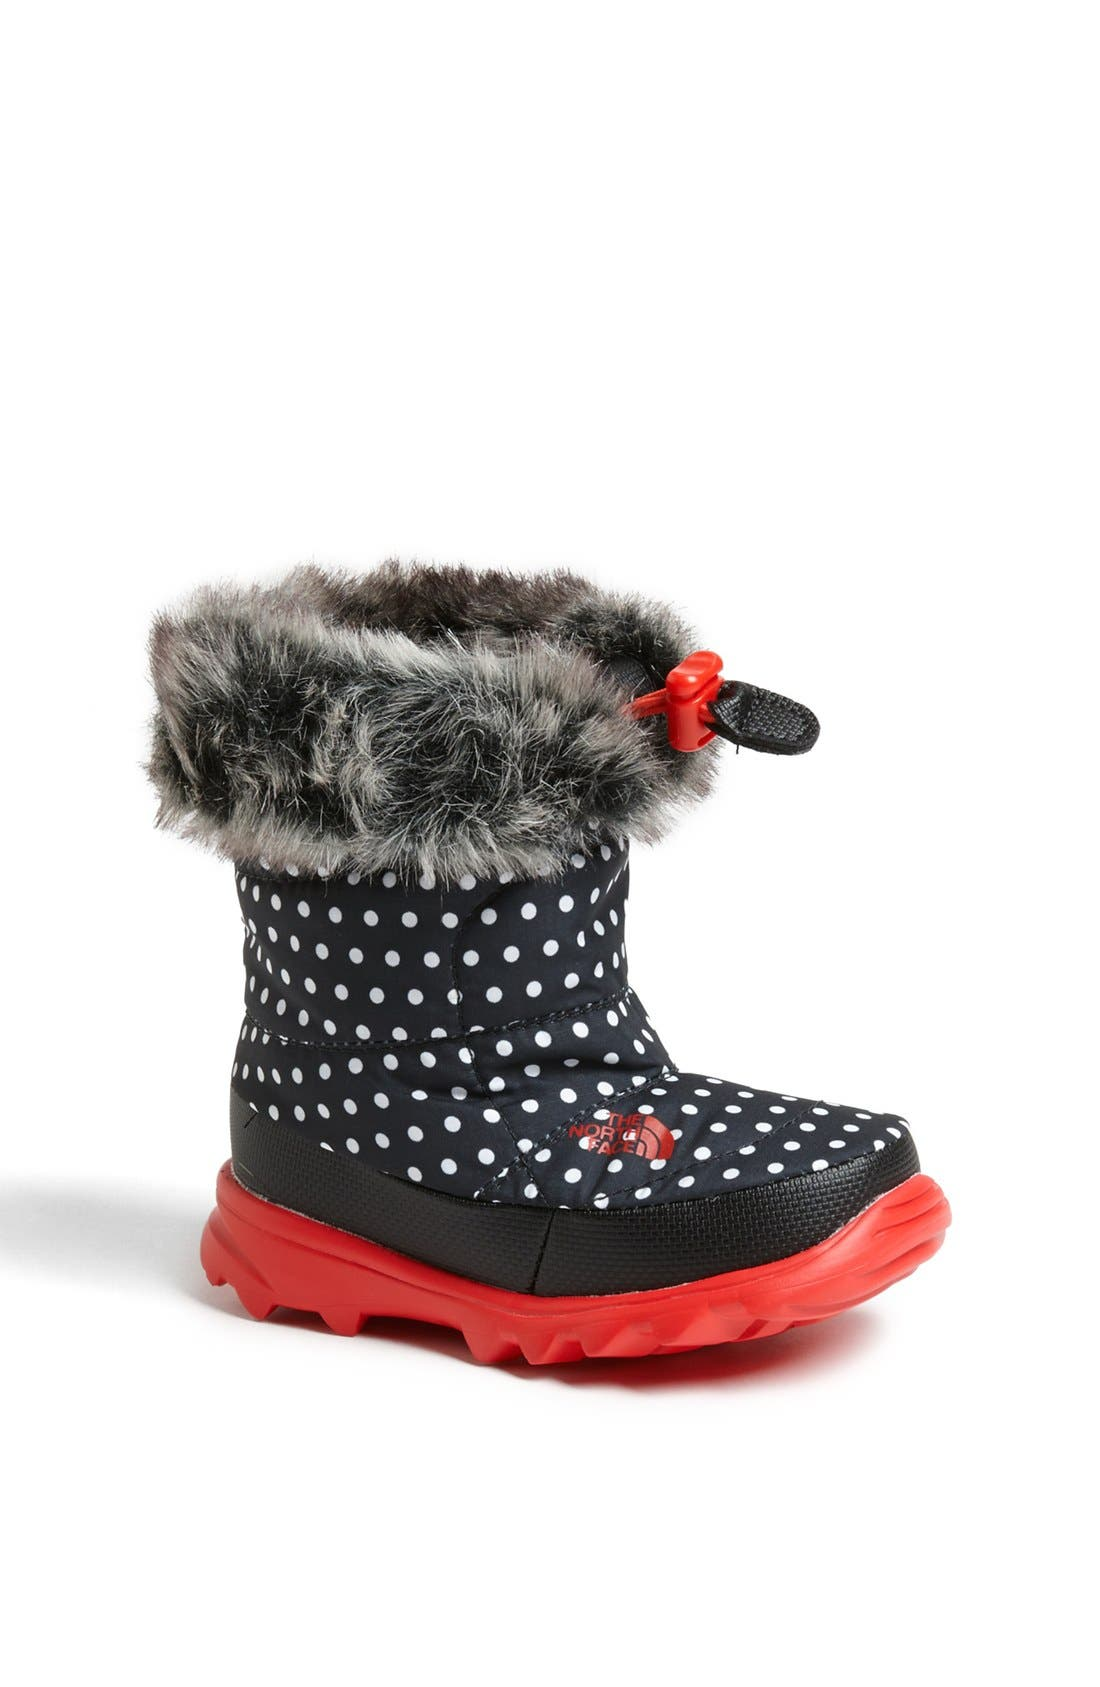 Alternate Image 1 Selected - The North Face 'Nuptse Fur II' Winter Boot (Walker & Toddler)